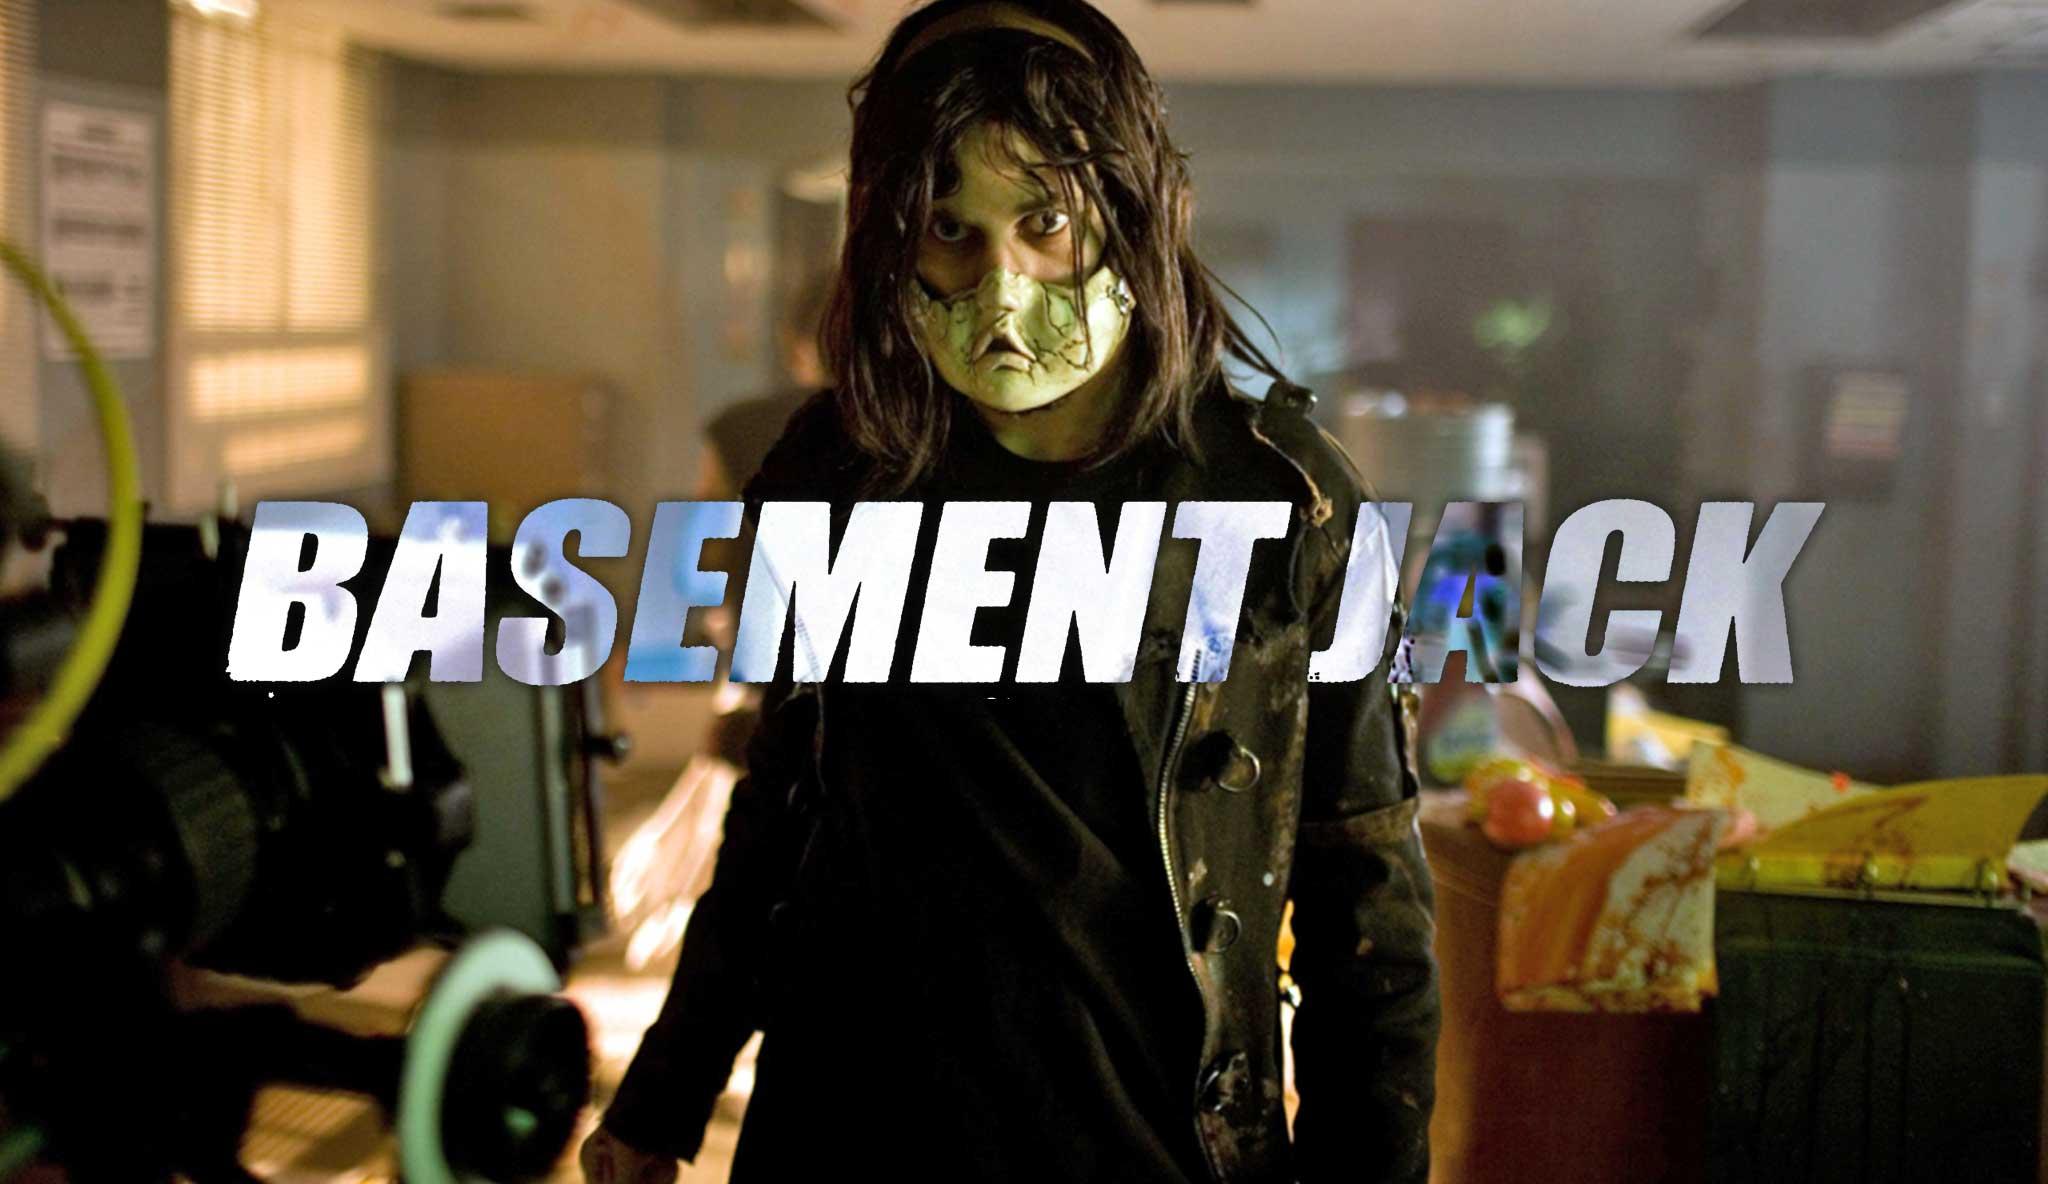 basement-jack\header.jpg